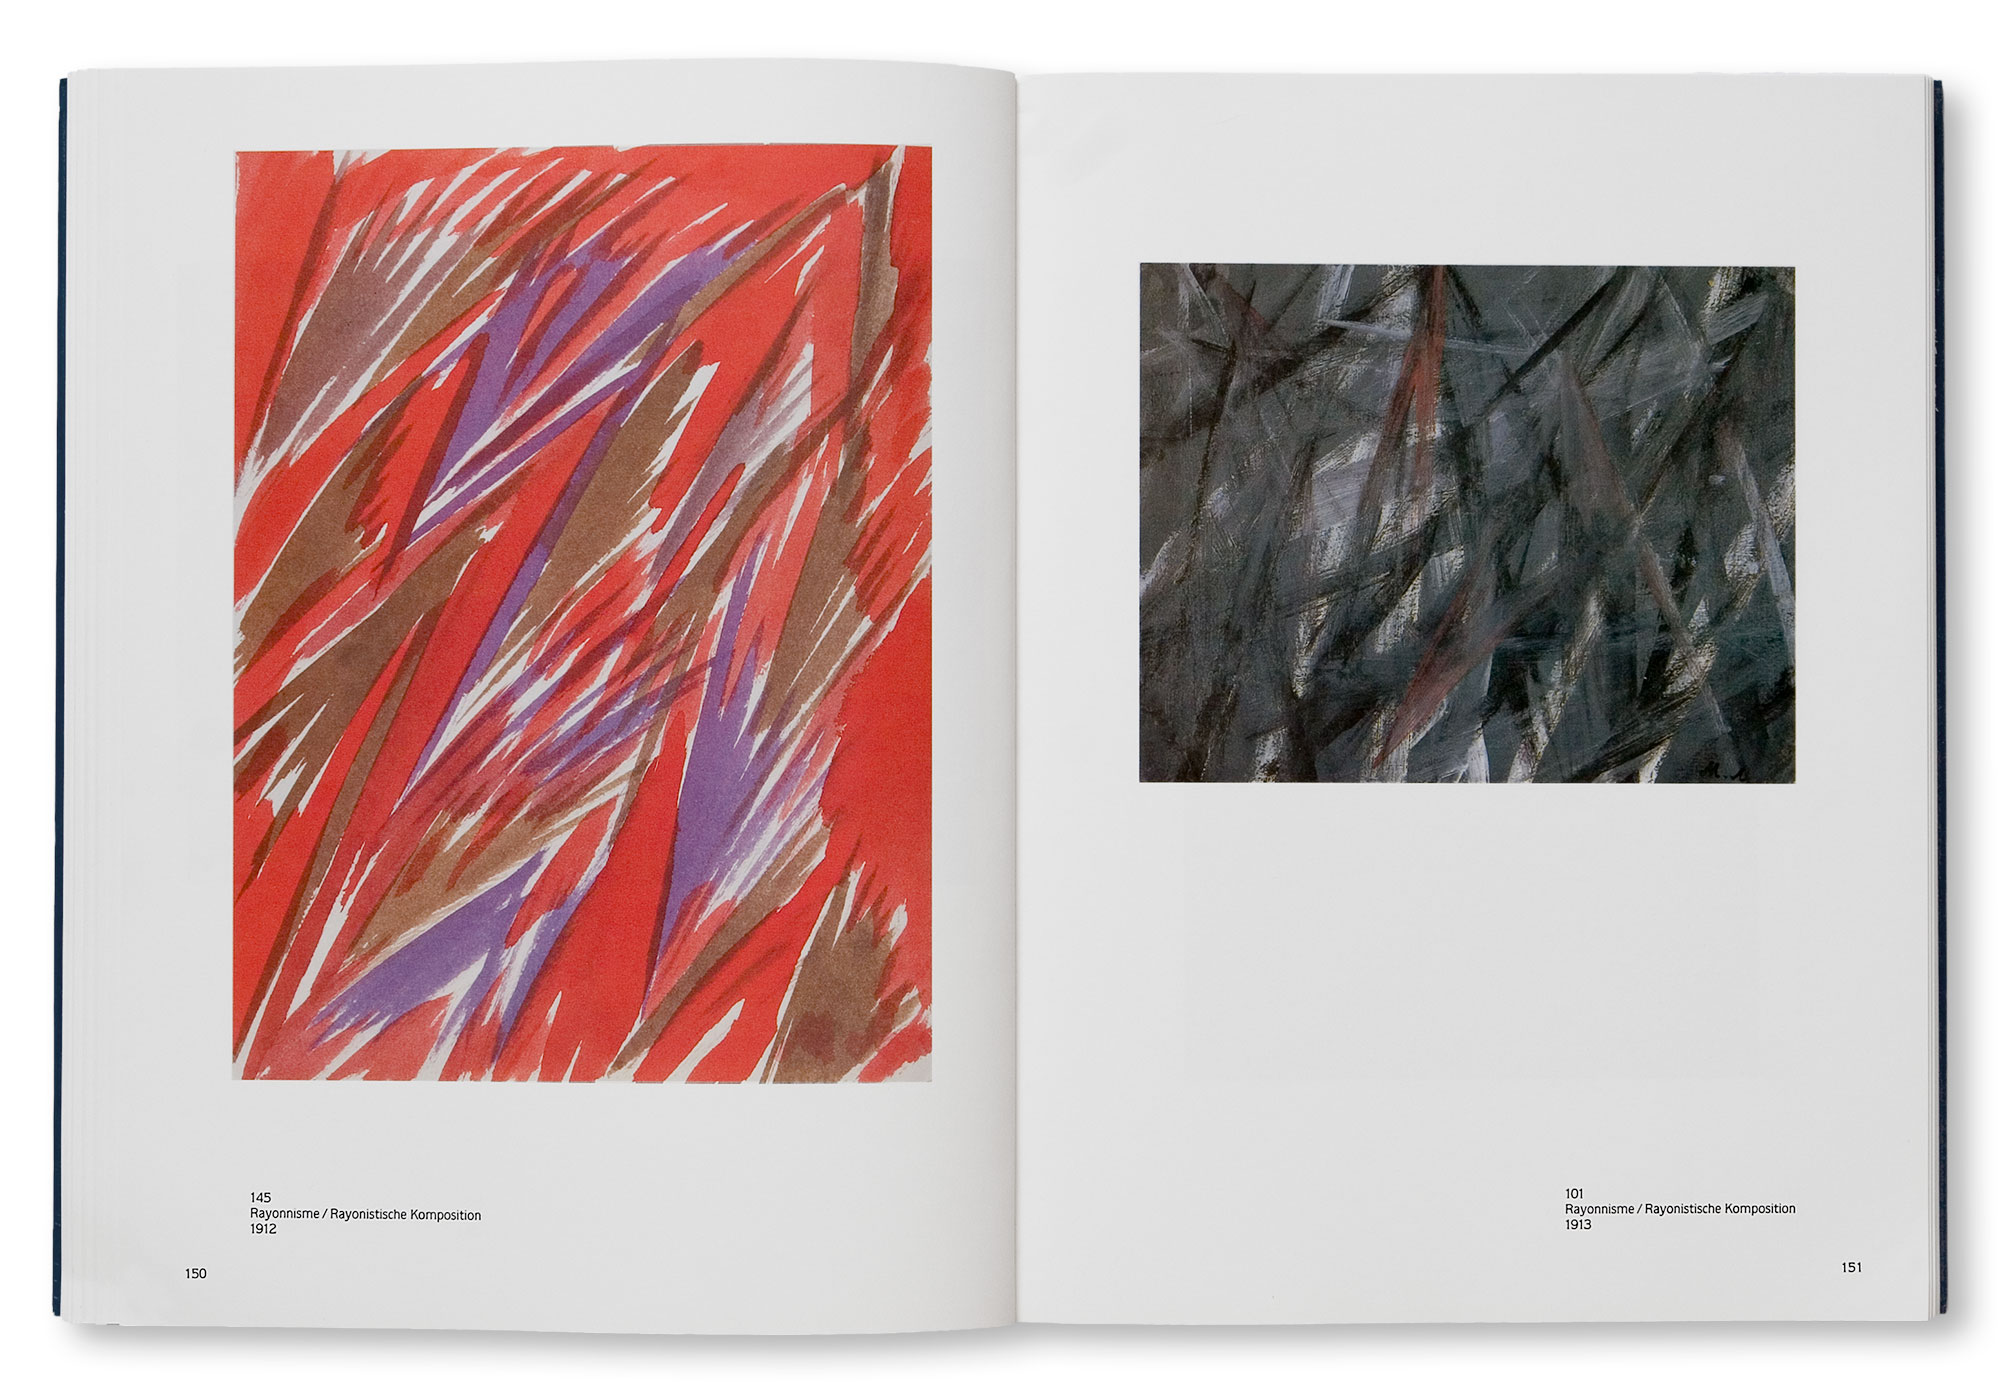 Catalogue, p150